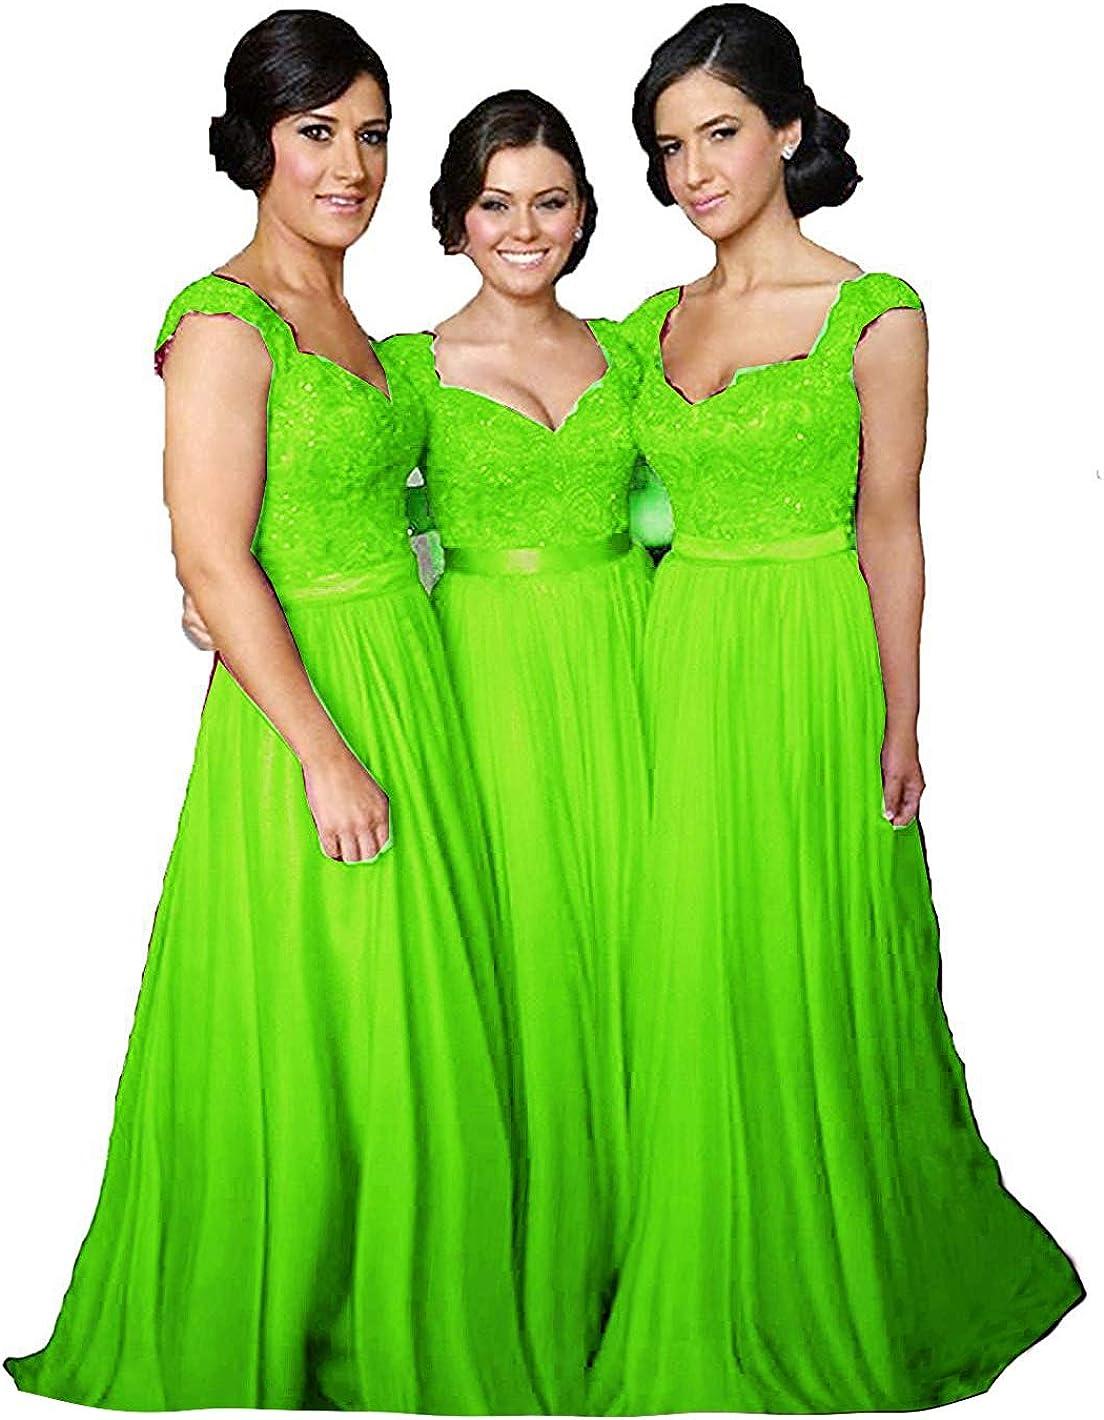 Fanciest Women' Cap Sleeve Lace Bridesmaid Dresses Long Wedding Party Gowns